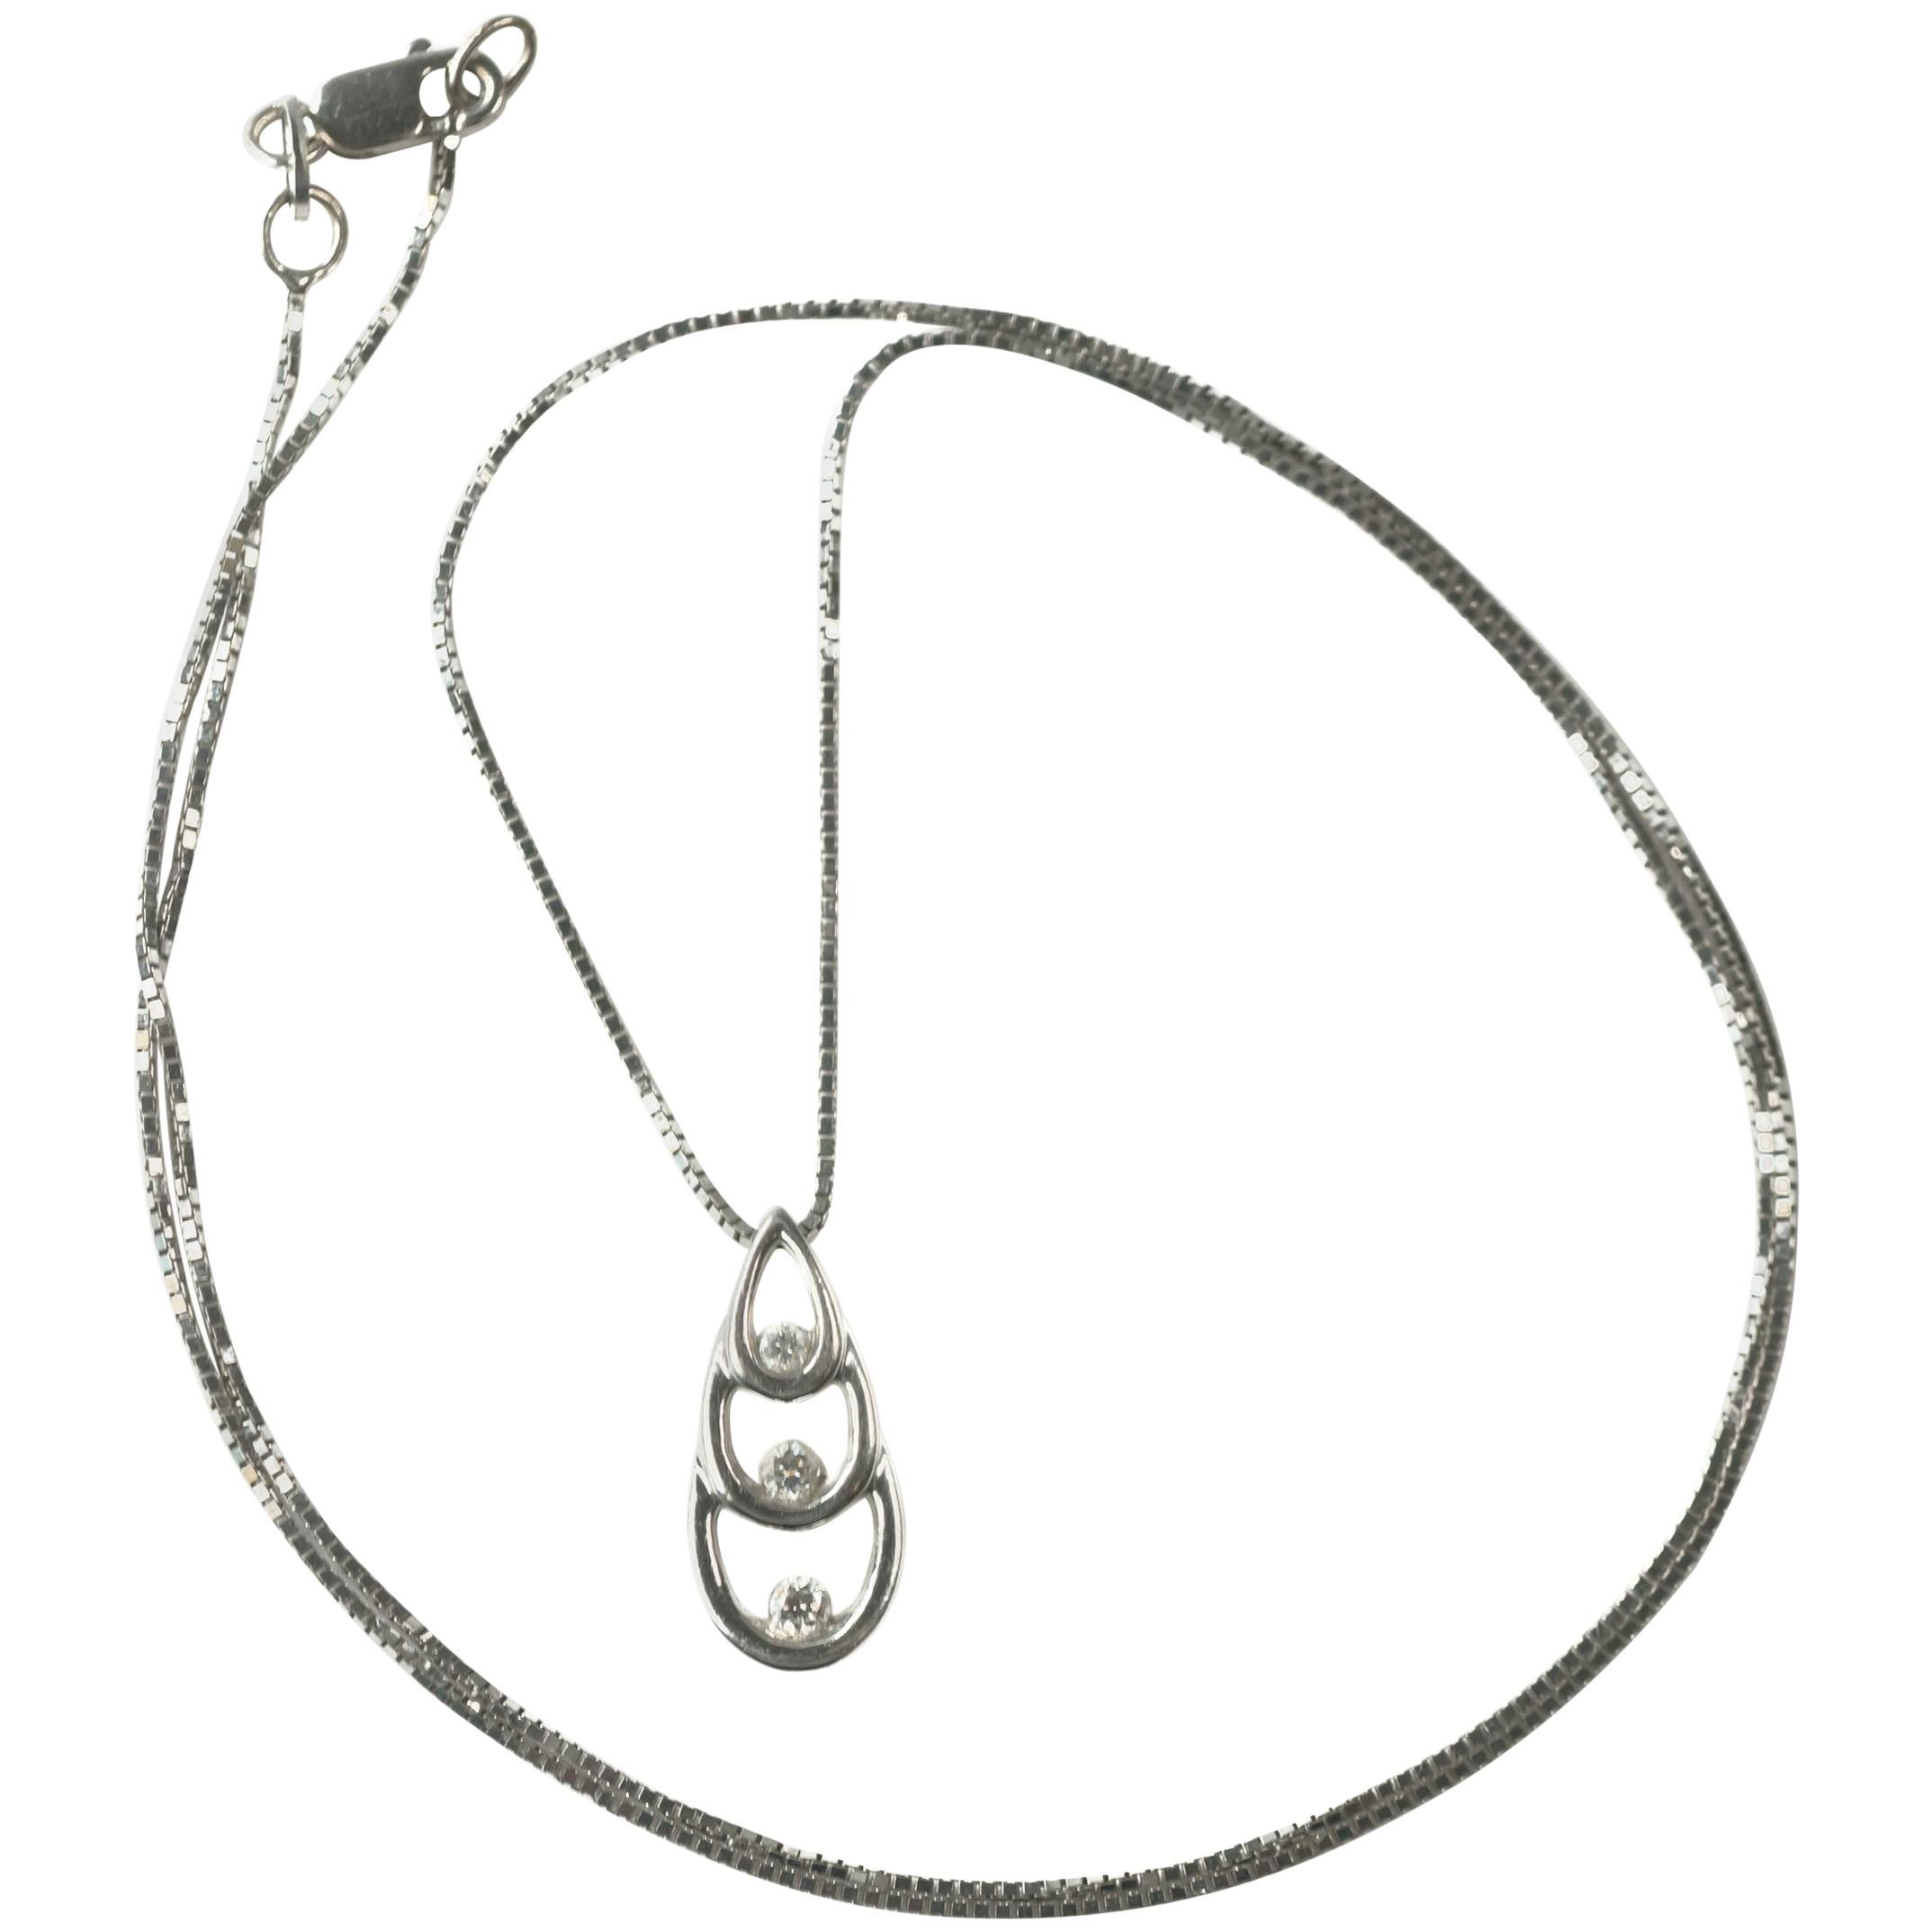 1970s Diamond 14 Karat White Gold Teardrop Pendant Necklace